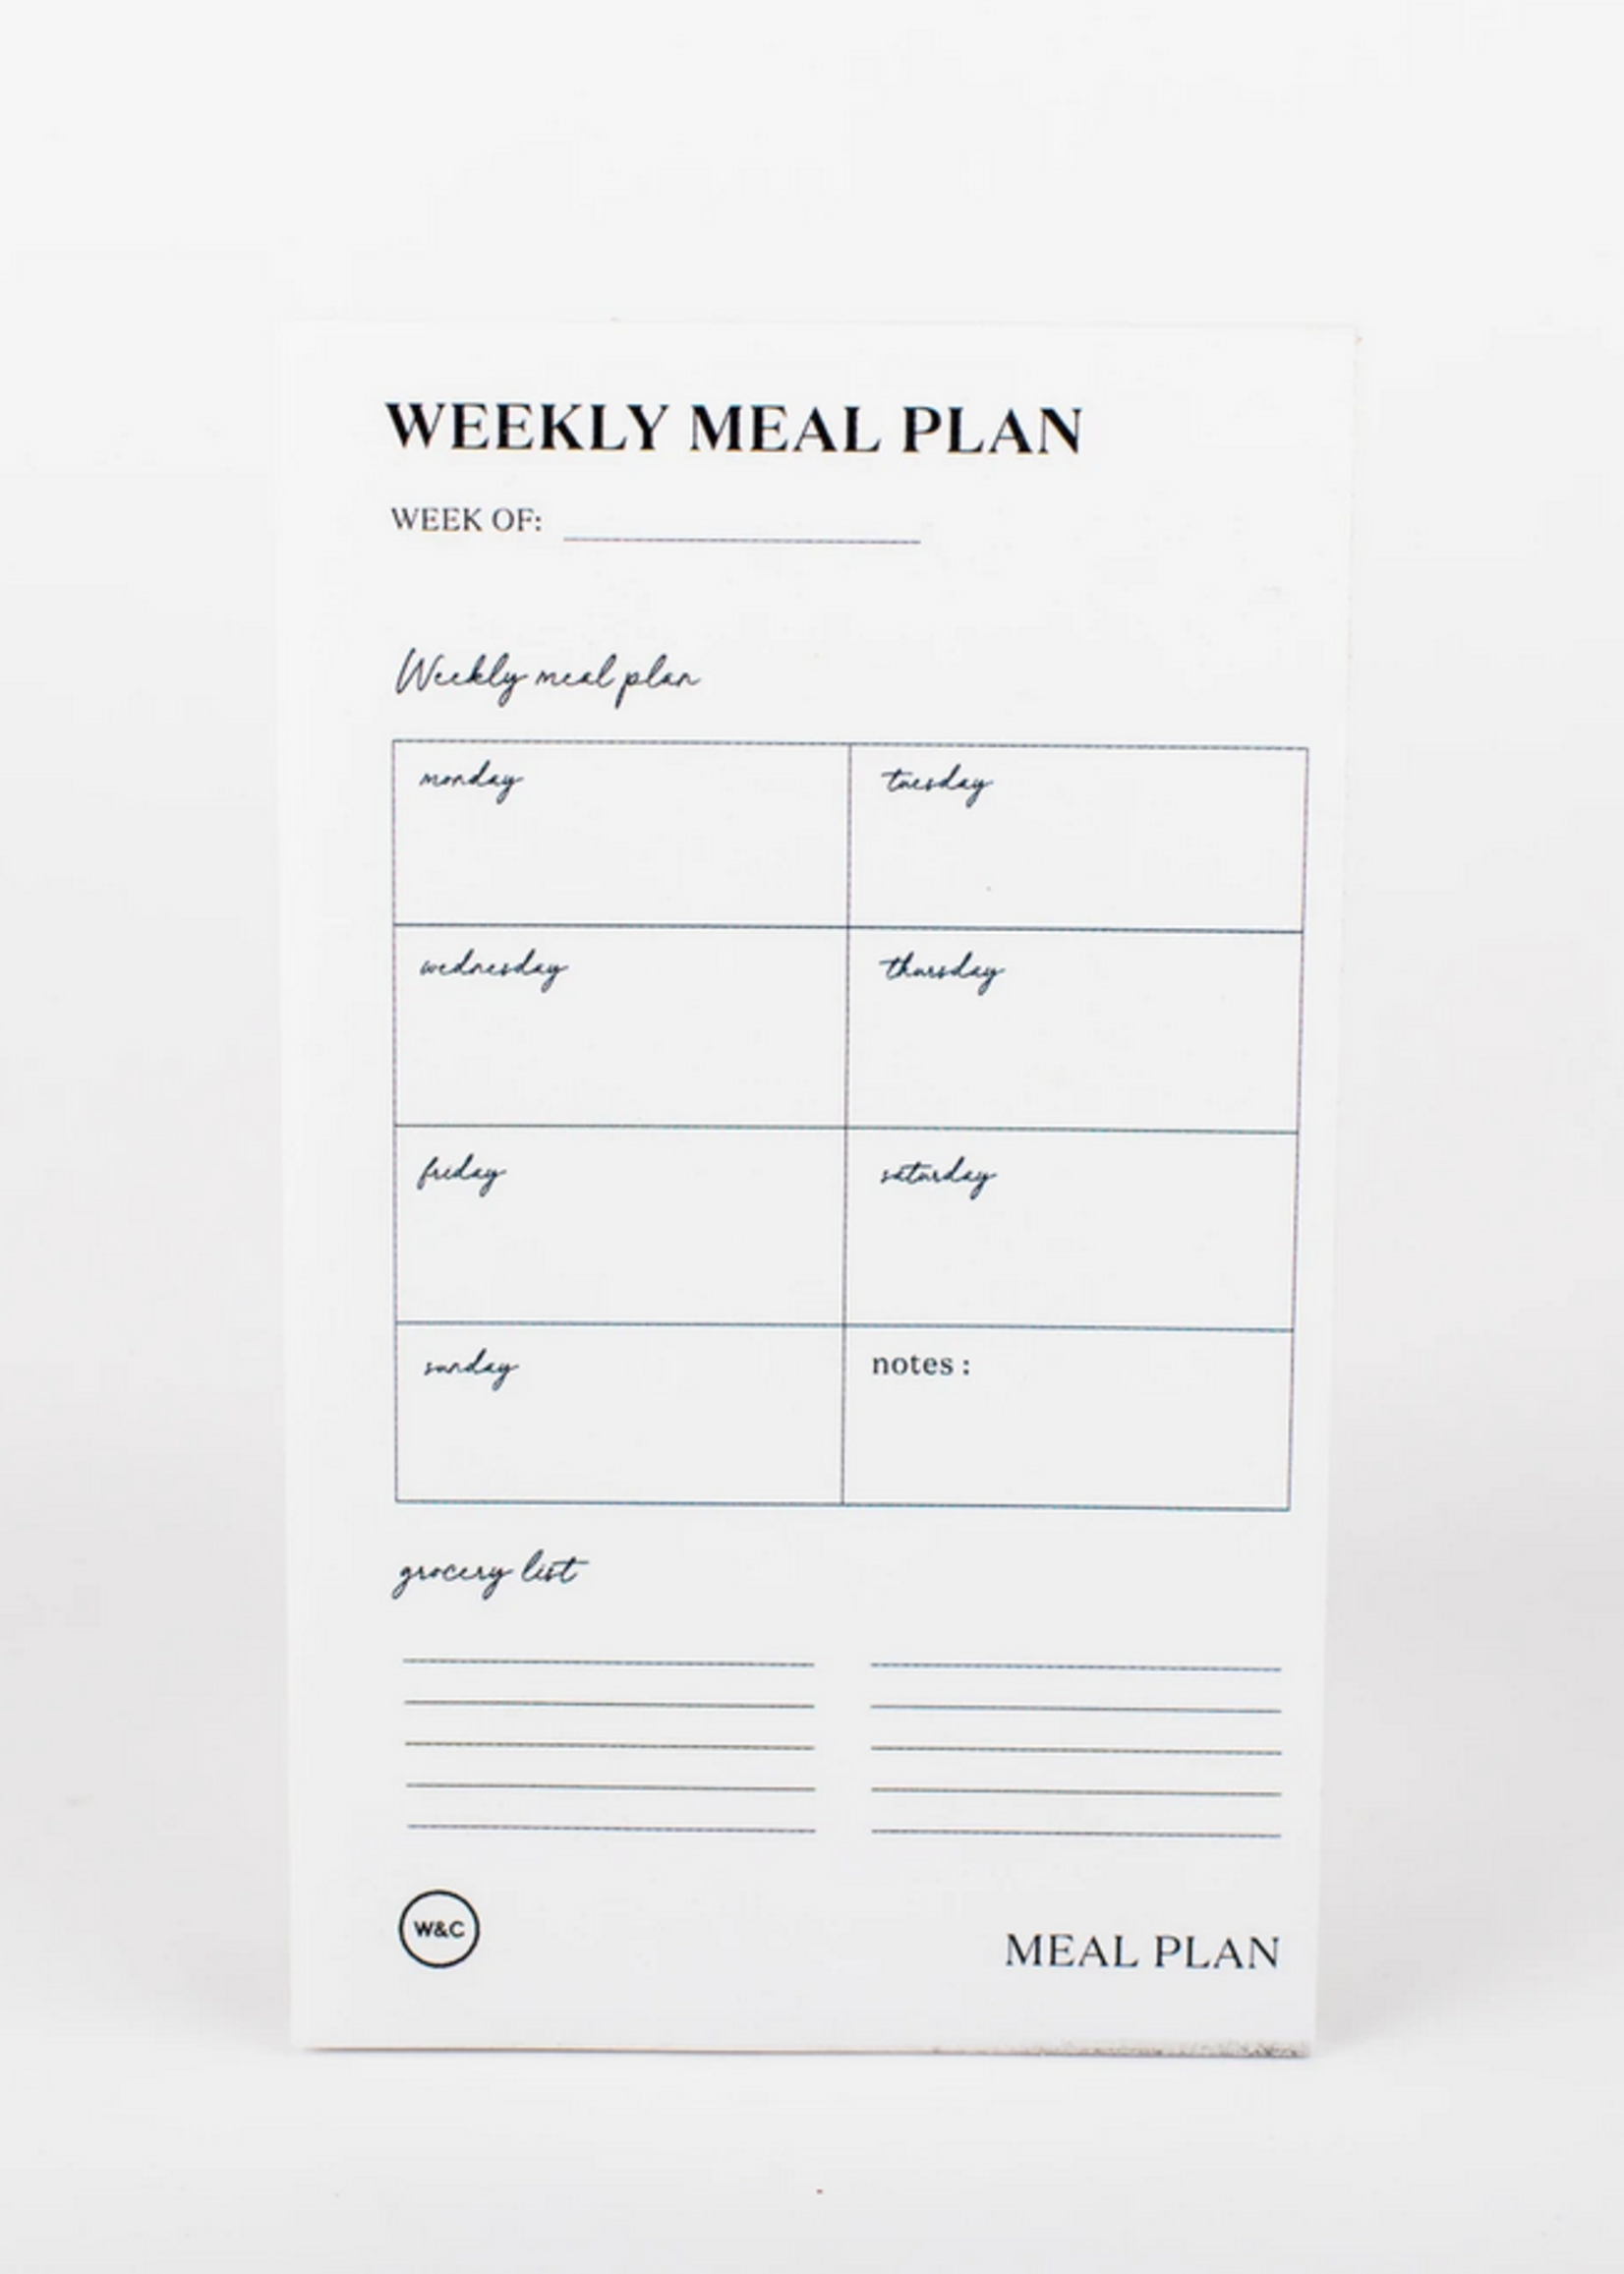 Wrinkle and Crease Weekly Meal Plan